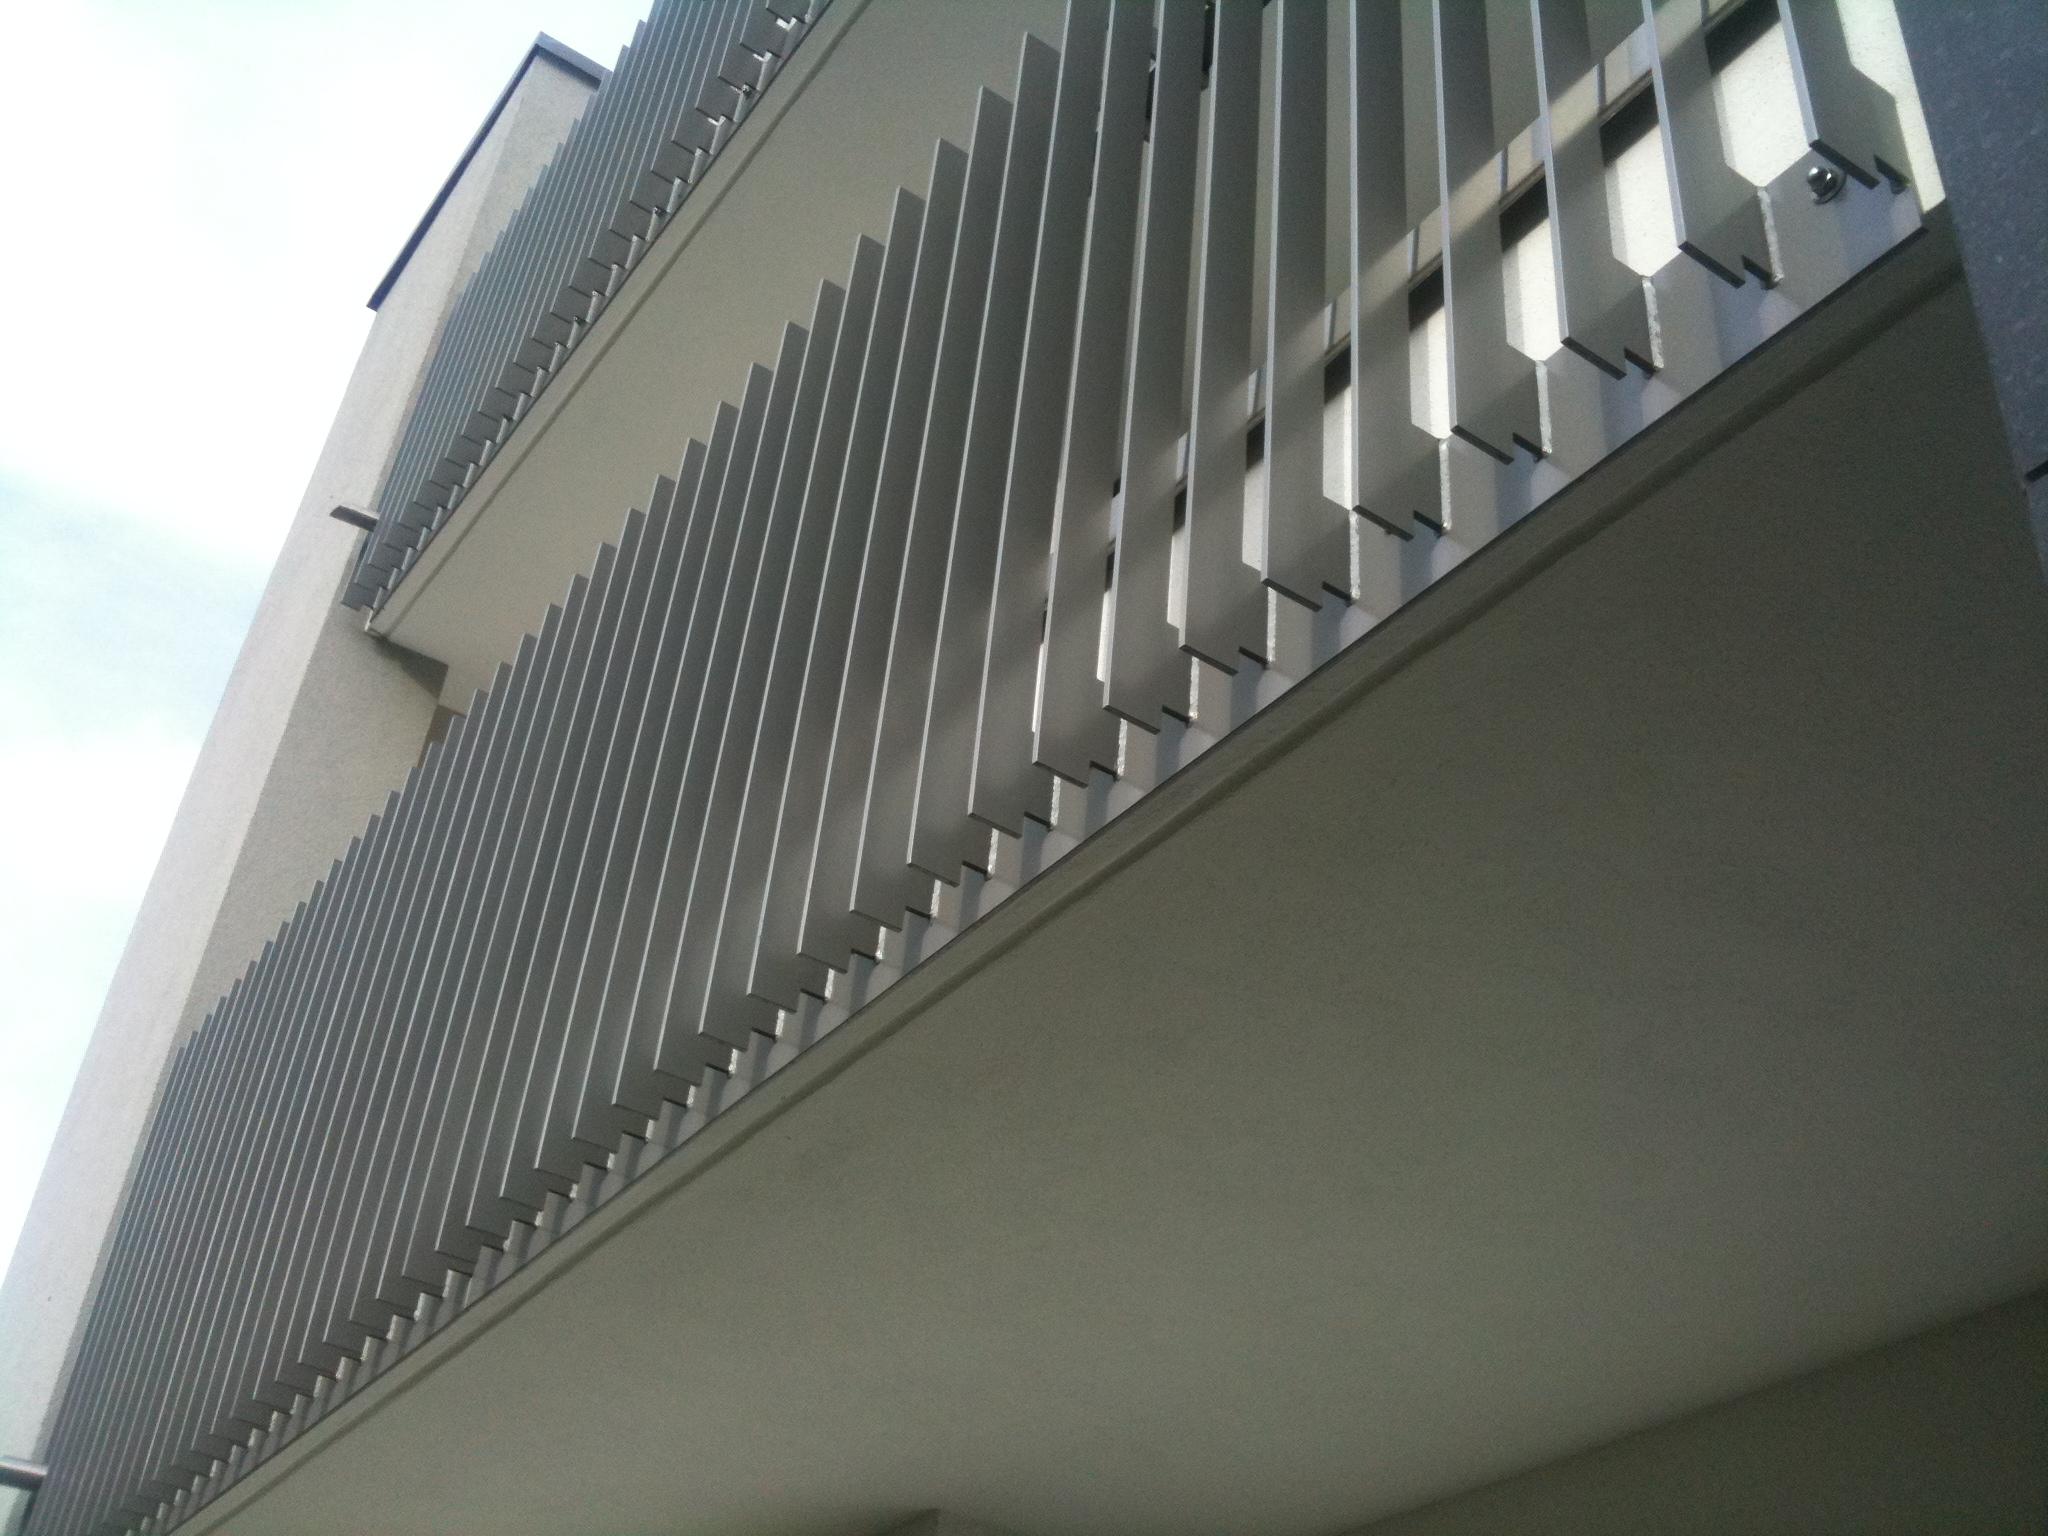 aluminium flachstahl gel nder preis auf anfrage metall. Black Bedroom Furniture Sets. Home Design Ideas